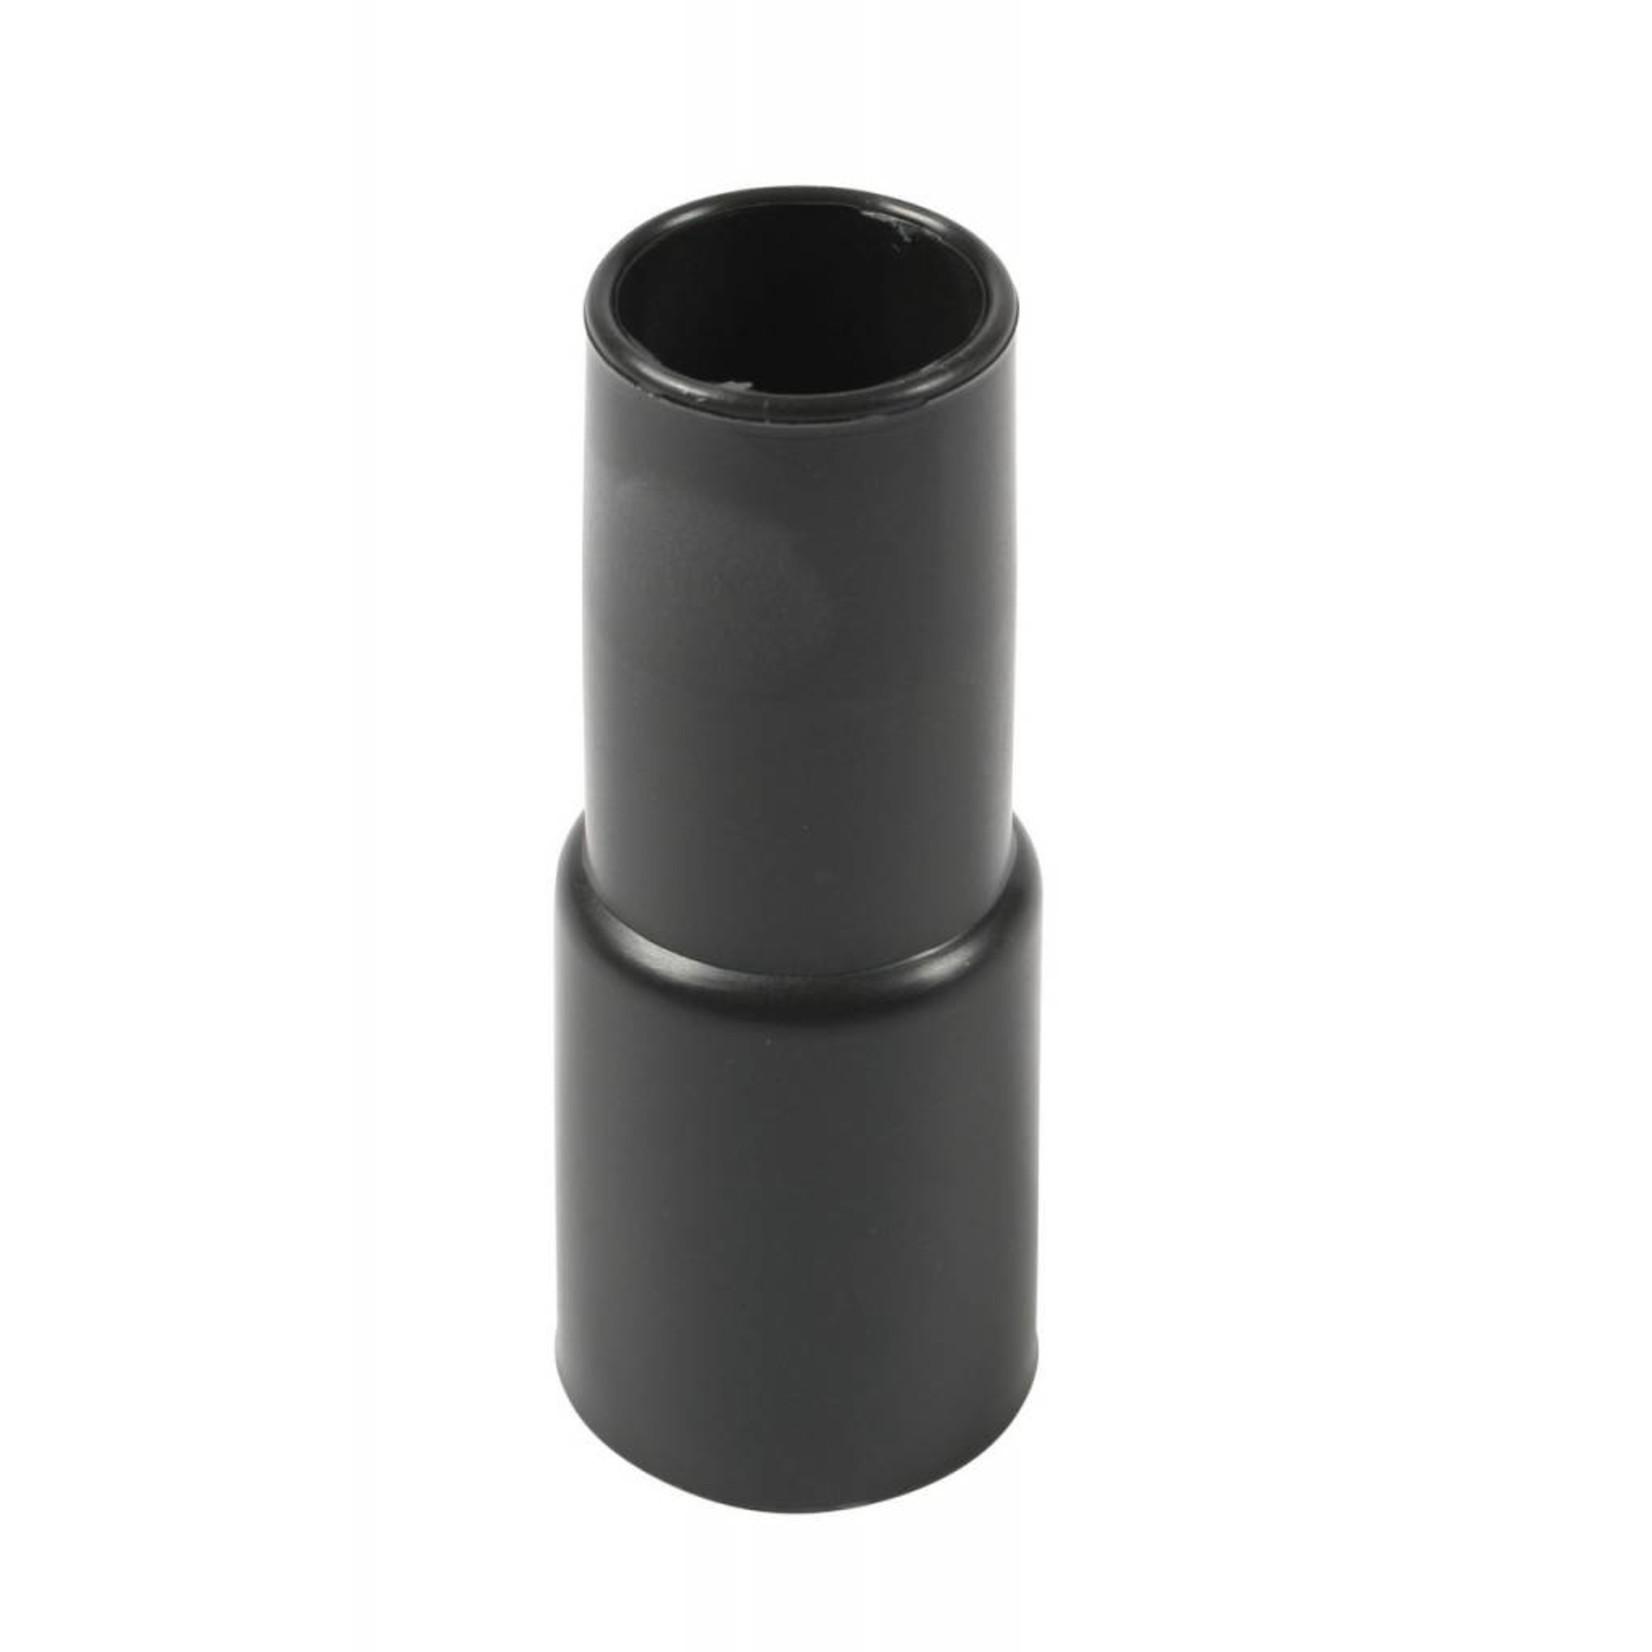 "Centec CenTec Adapter 1.25"" (32mm) to 1.375"" (35mm)"